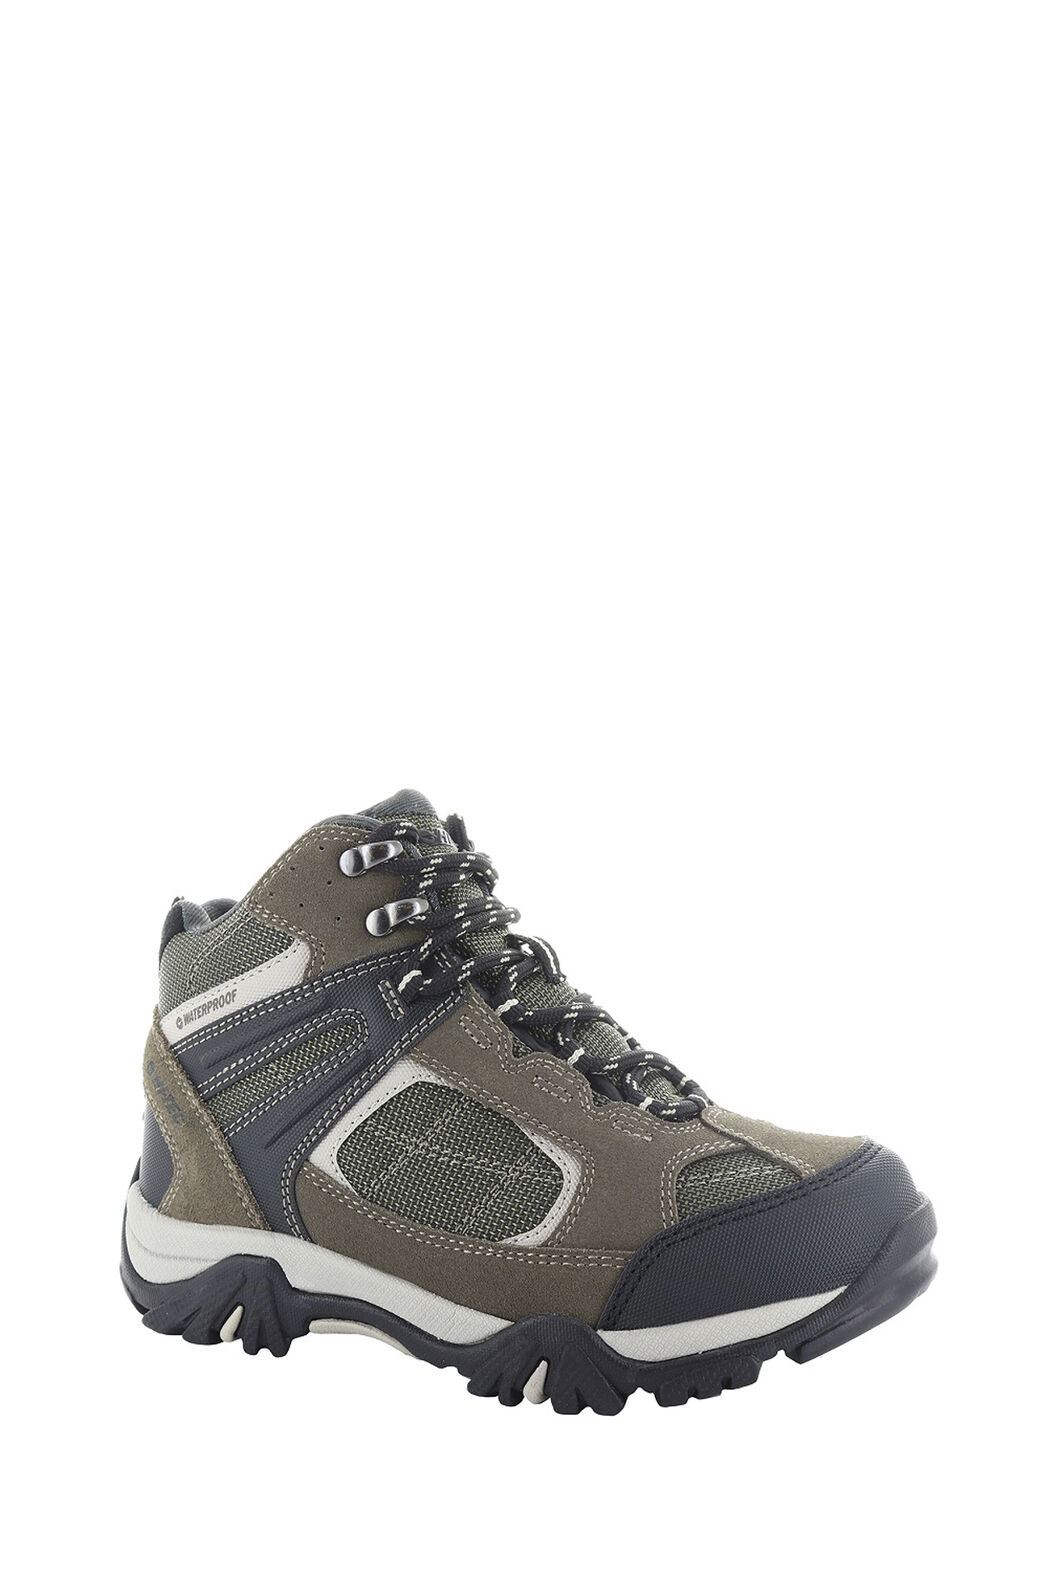 Hi-Tec Altitude VI Lite WP Boots — Kids', DarkTaupe/OliveNight/WarmGrey, hi-res